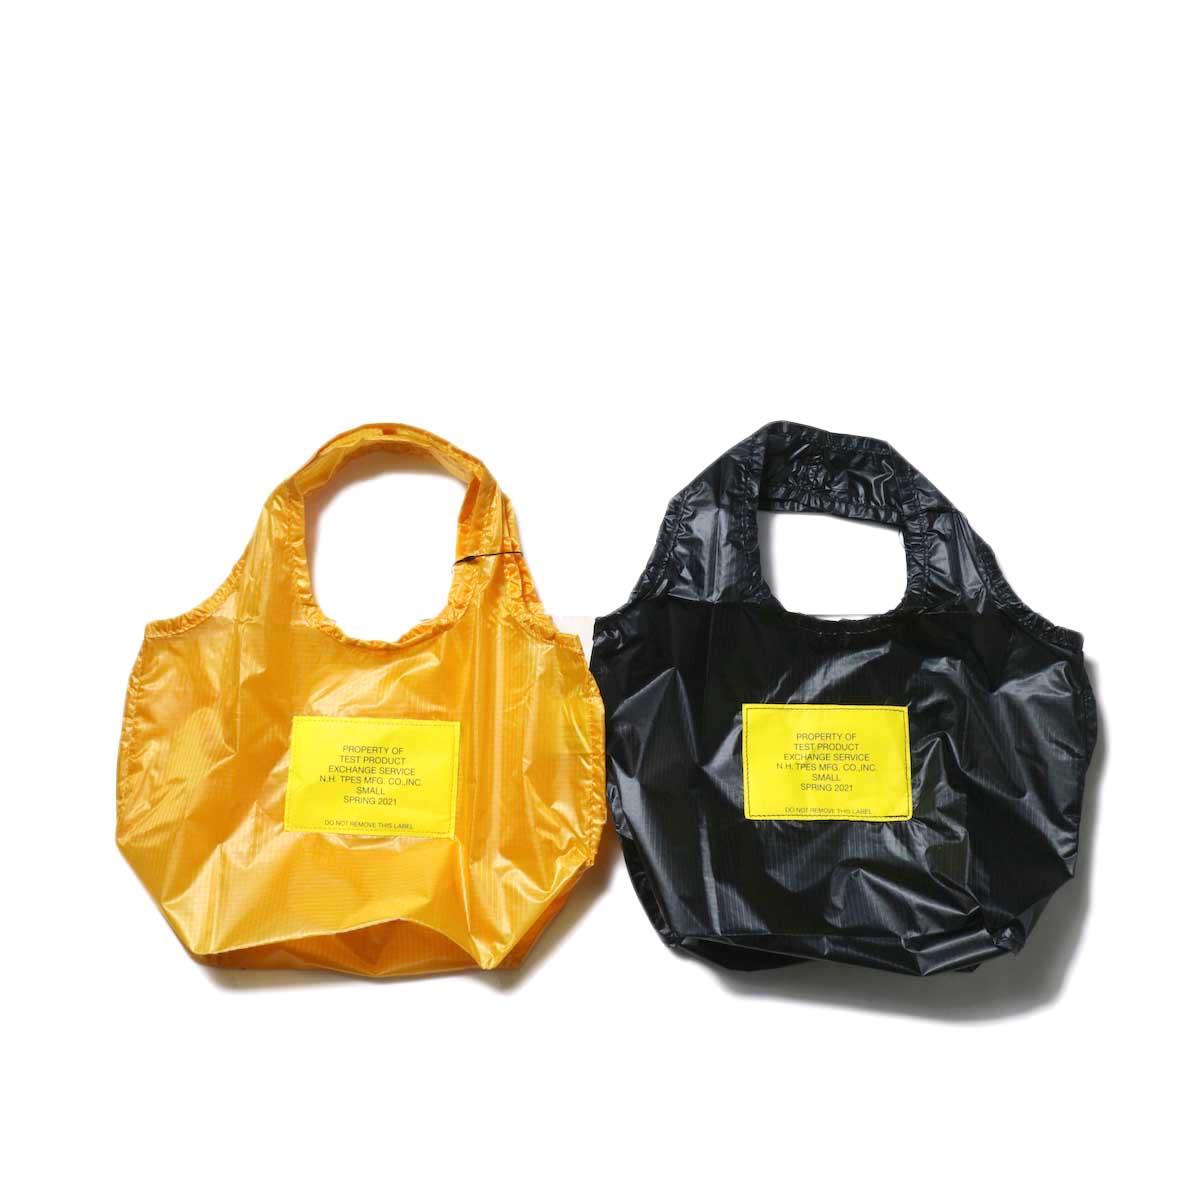 N.HOOLYWOOD / 9211-AC87 pieces BAG (SMALL)